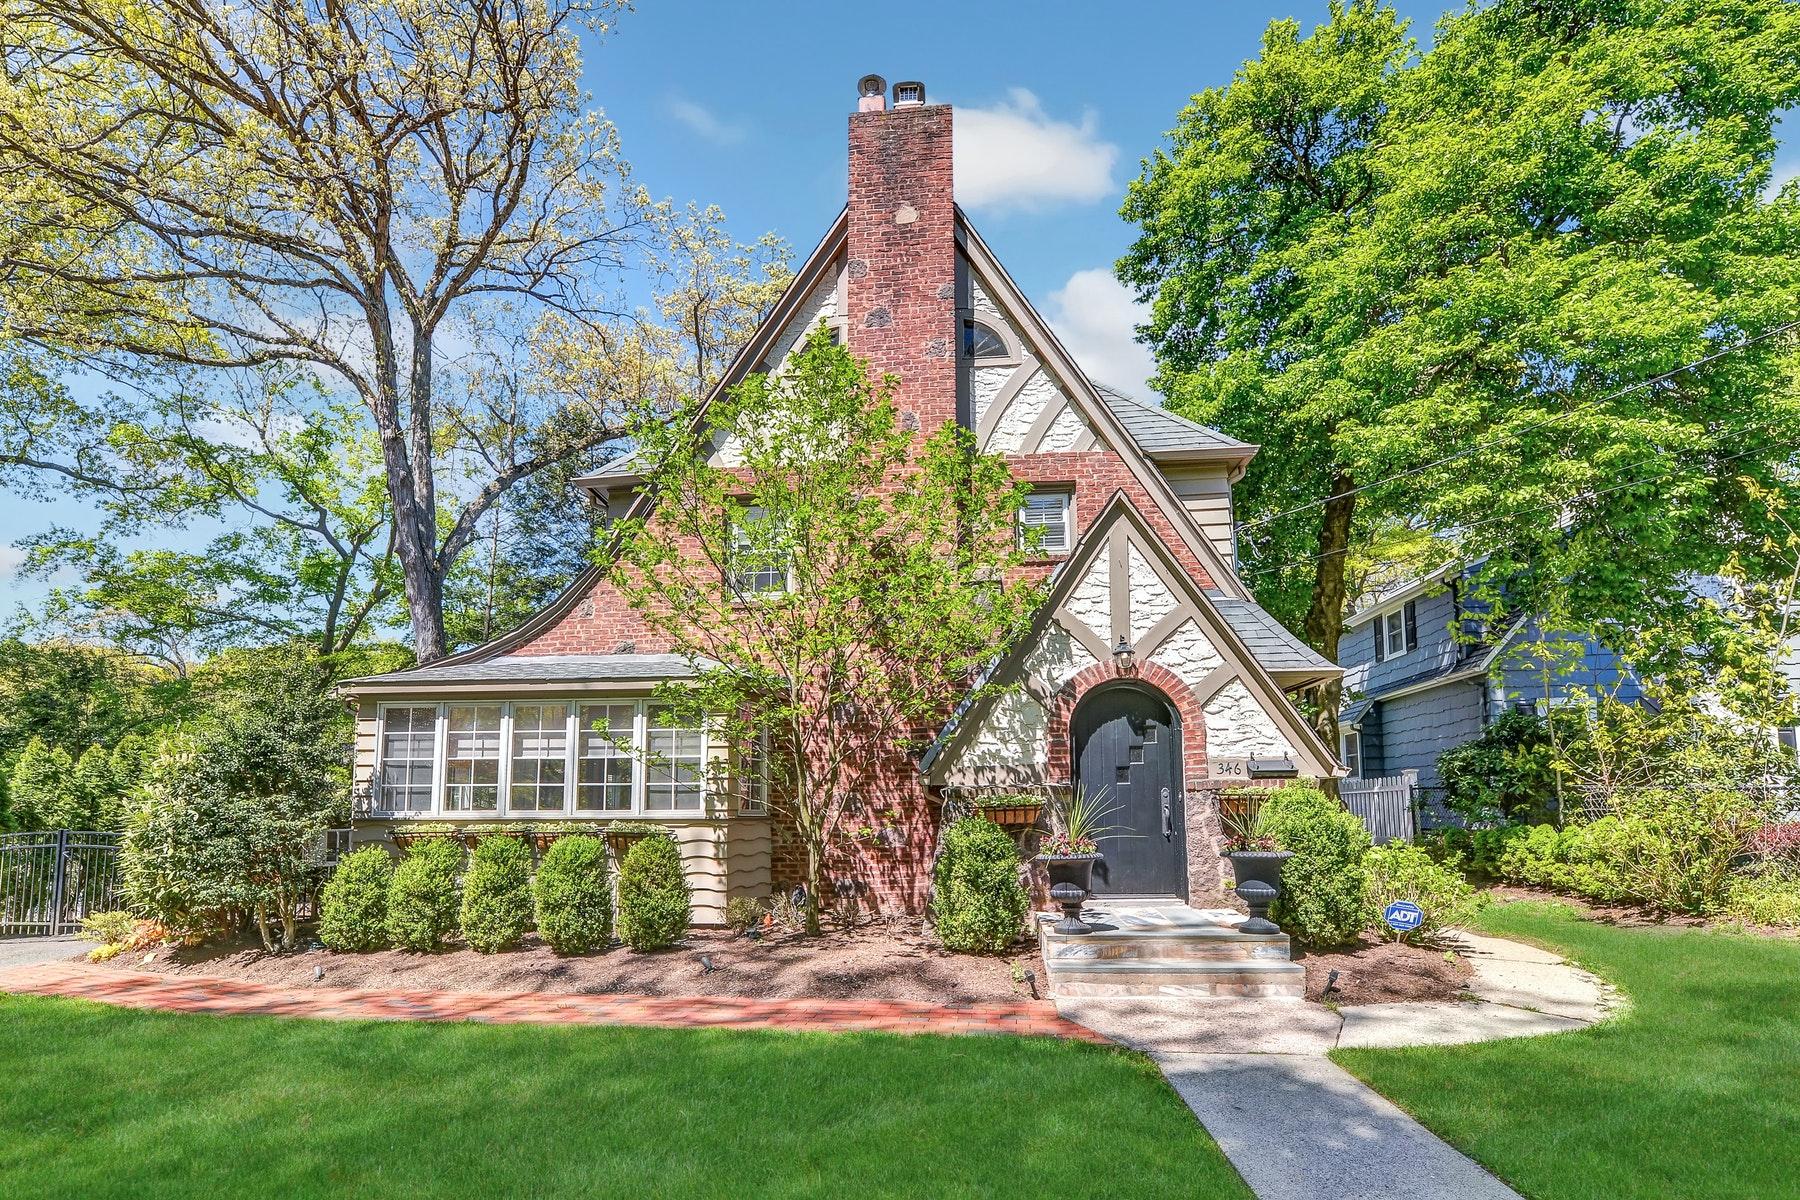 Property 为 销售 在 Beautiful Ridgewood Tudor 346 N. Monroe Street, 里奇伍德, 新泽西州 07450 美国